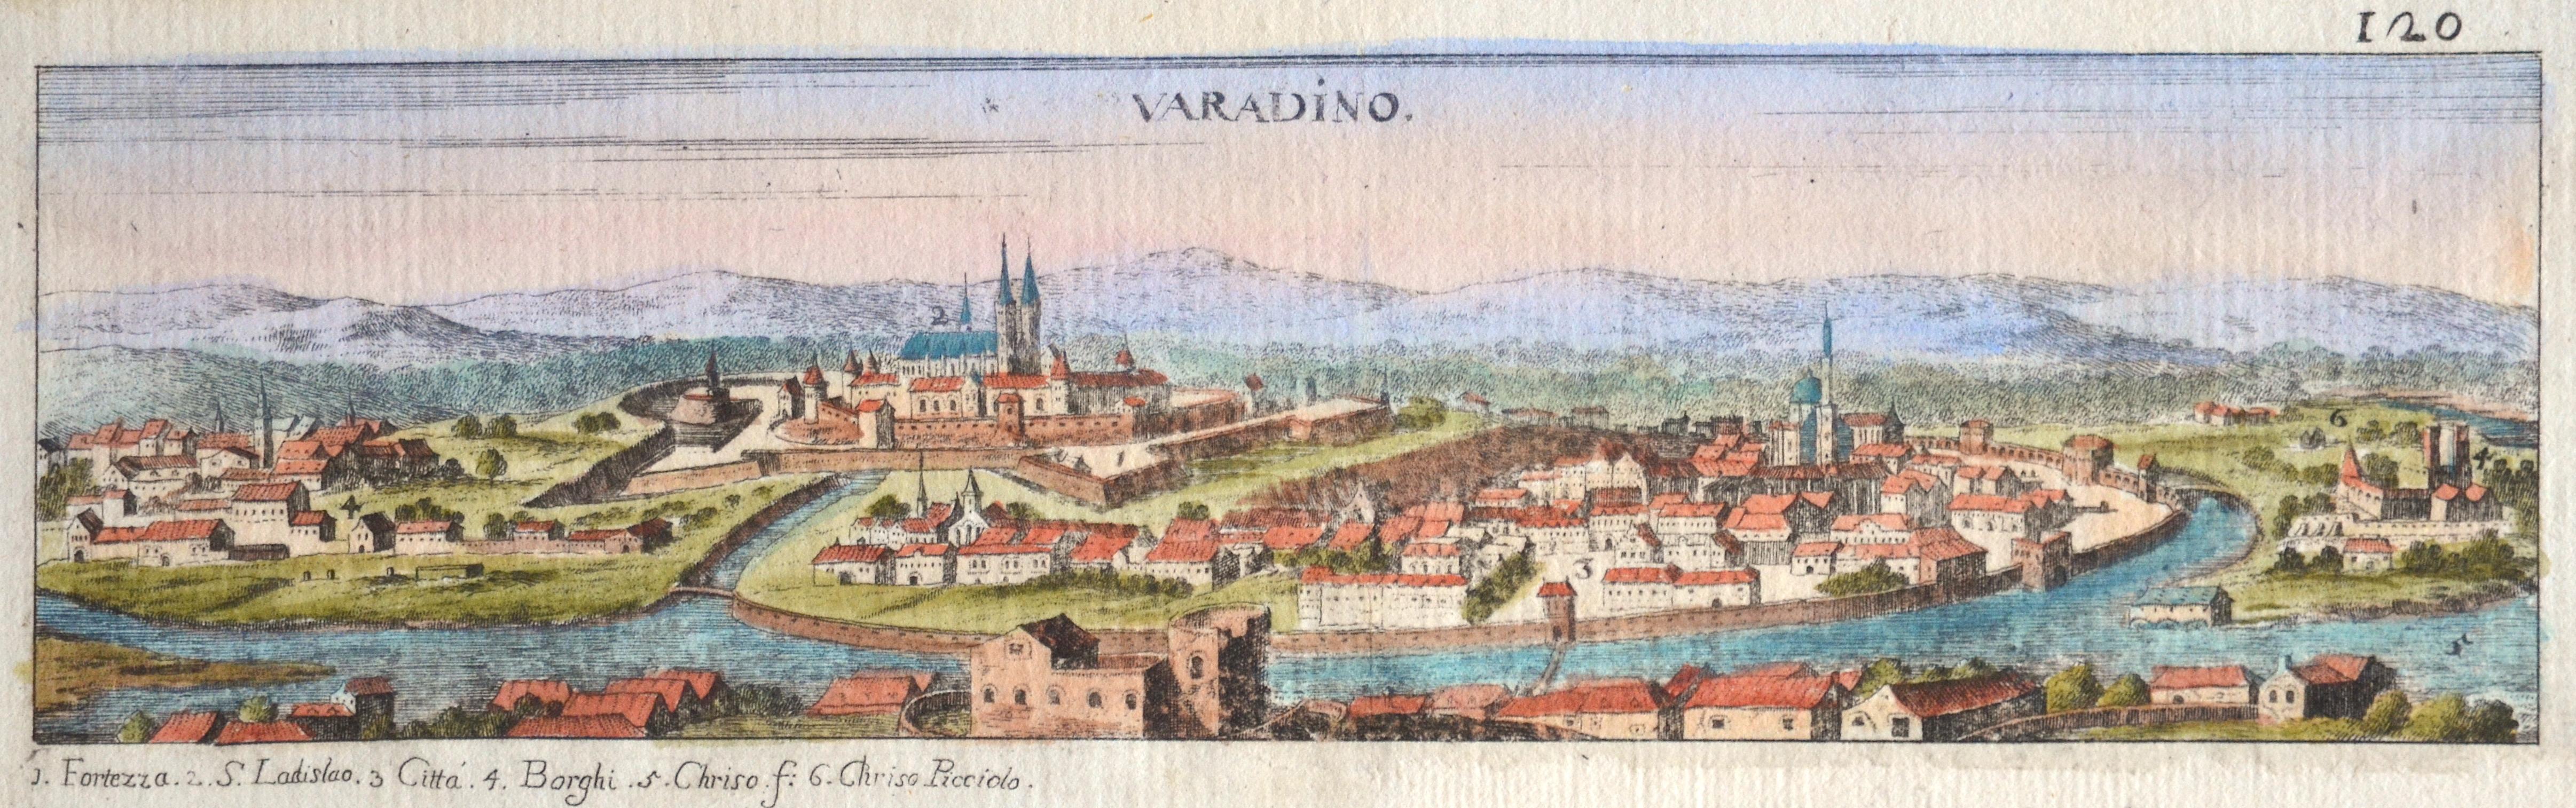 Anonymus  Varadino.